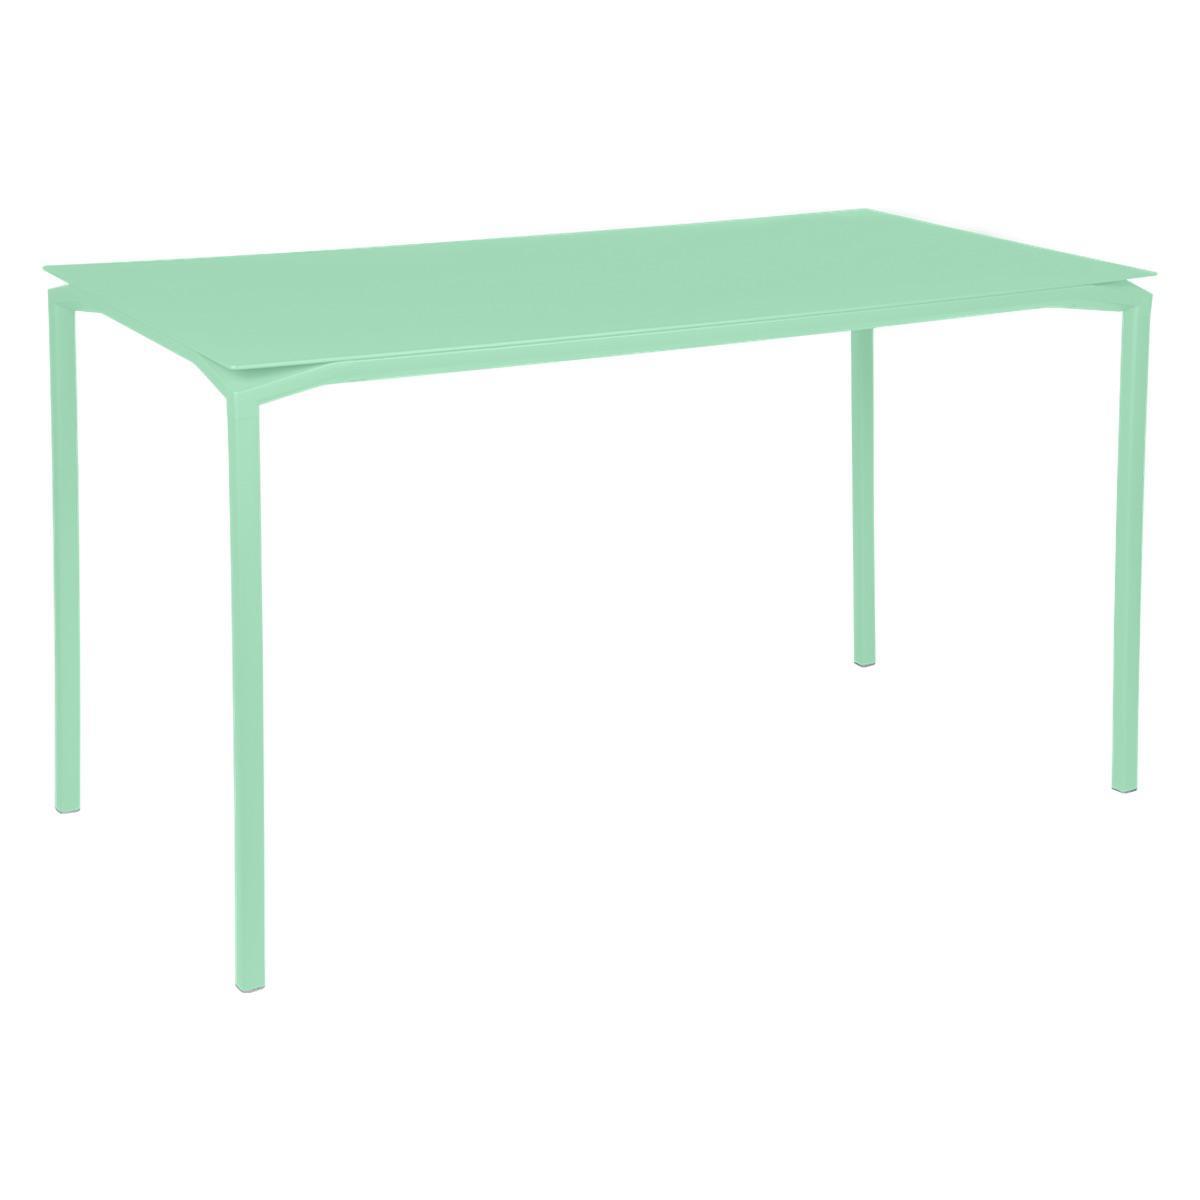 Table 80x160cm CALVI Fermob vert opaline